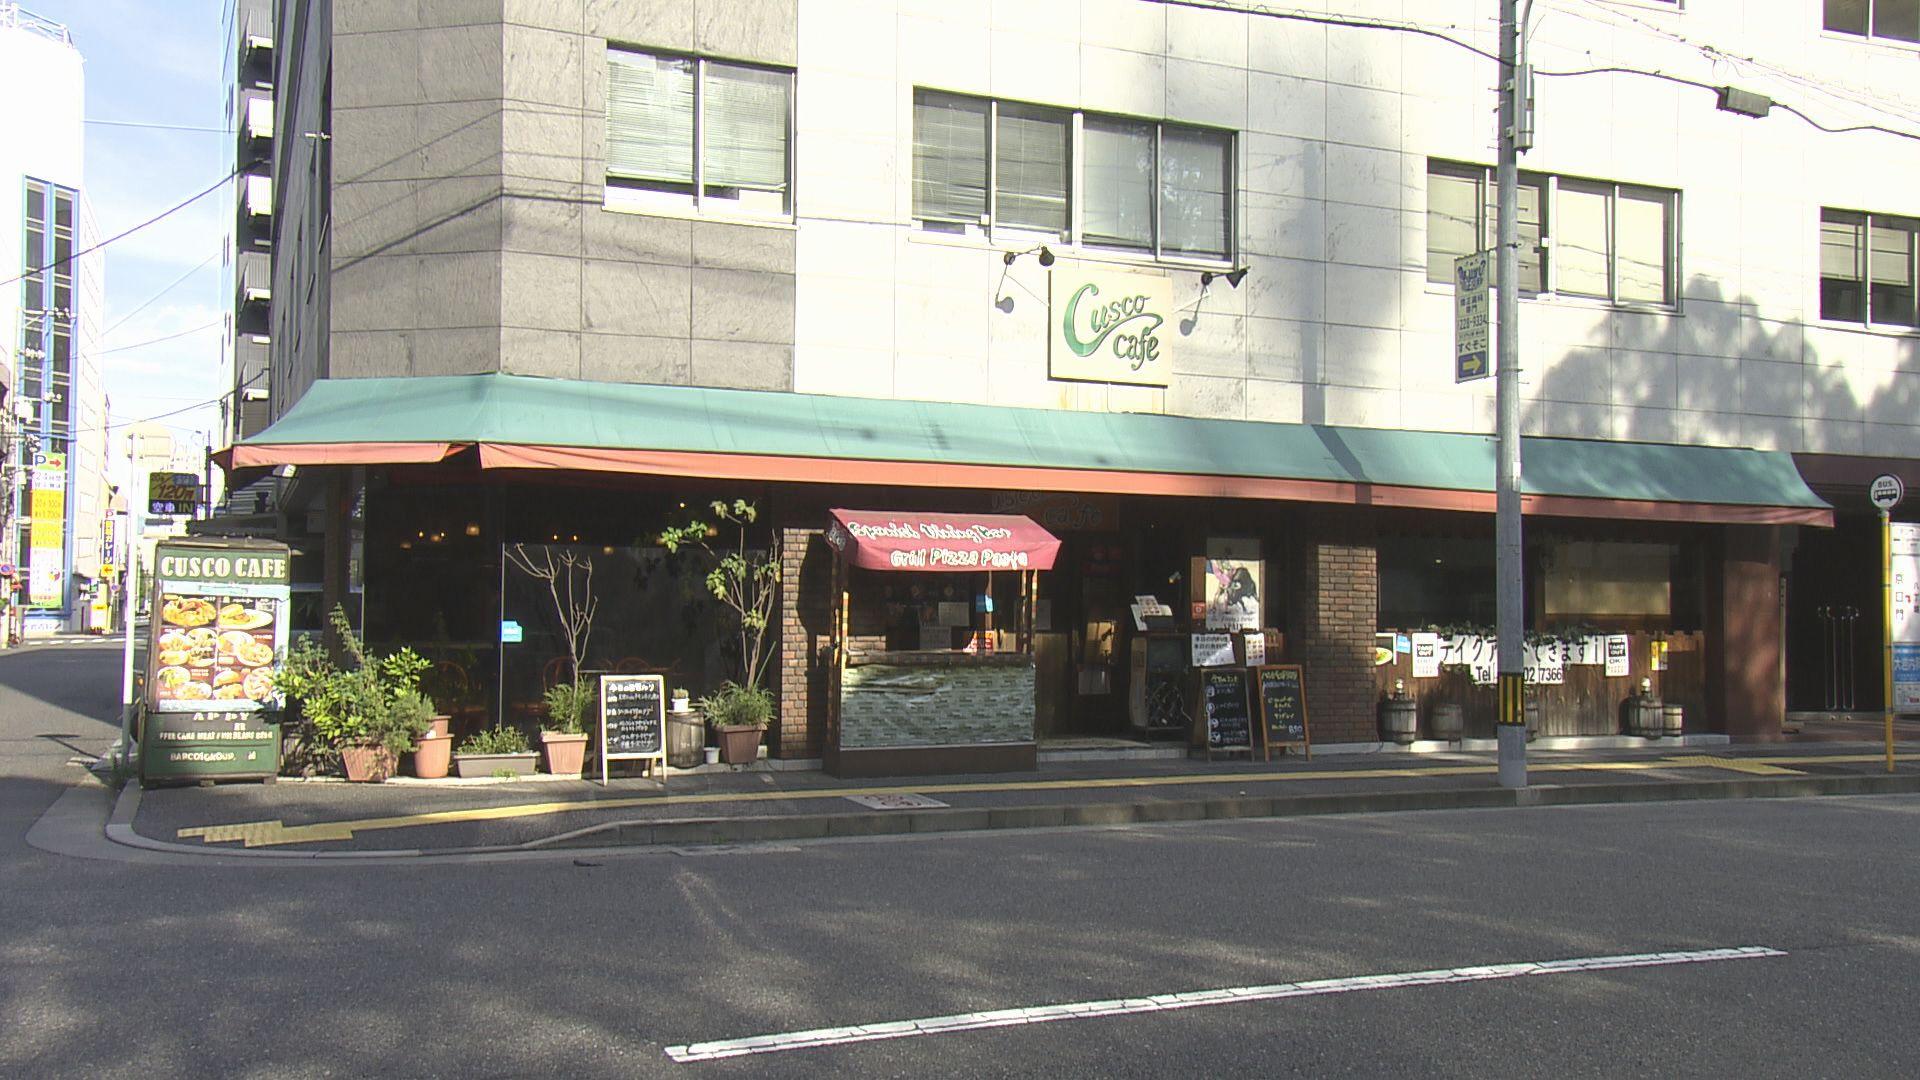 「Cusco Cafe」(クスコカフェ)